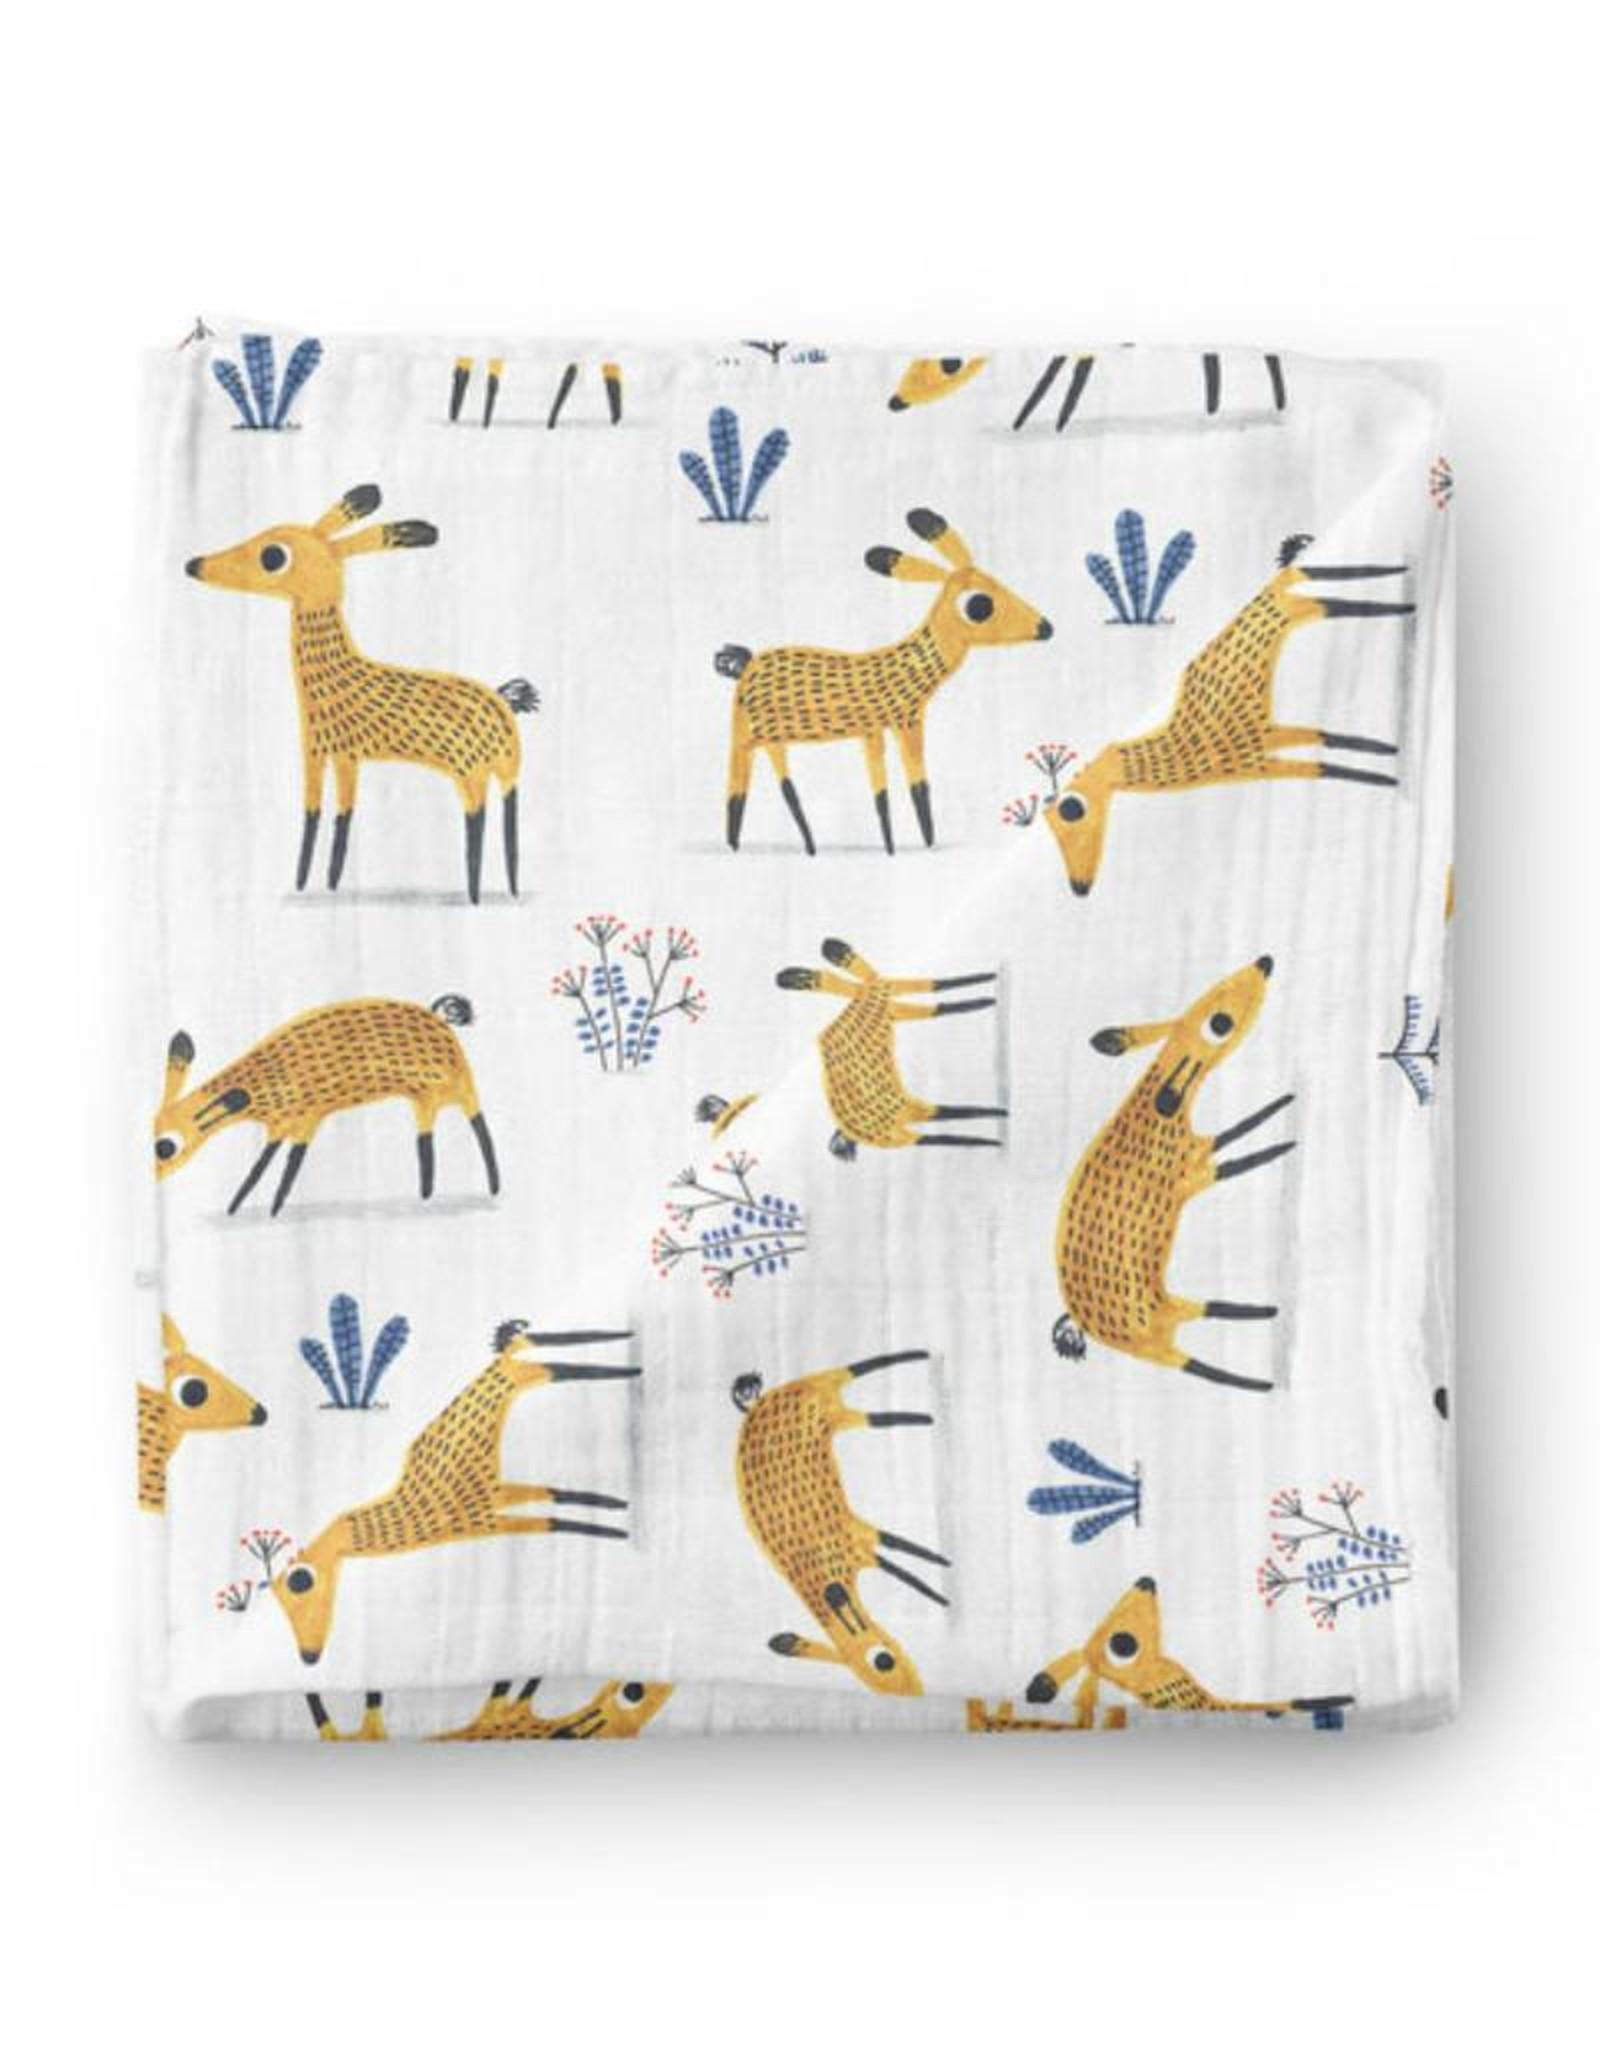 Olé Hop Bamboo blanket - Deer - Elise Gravel